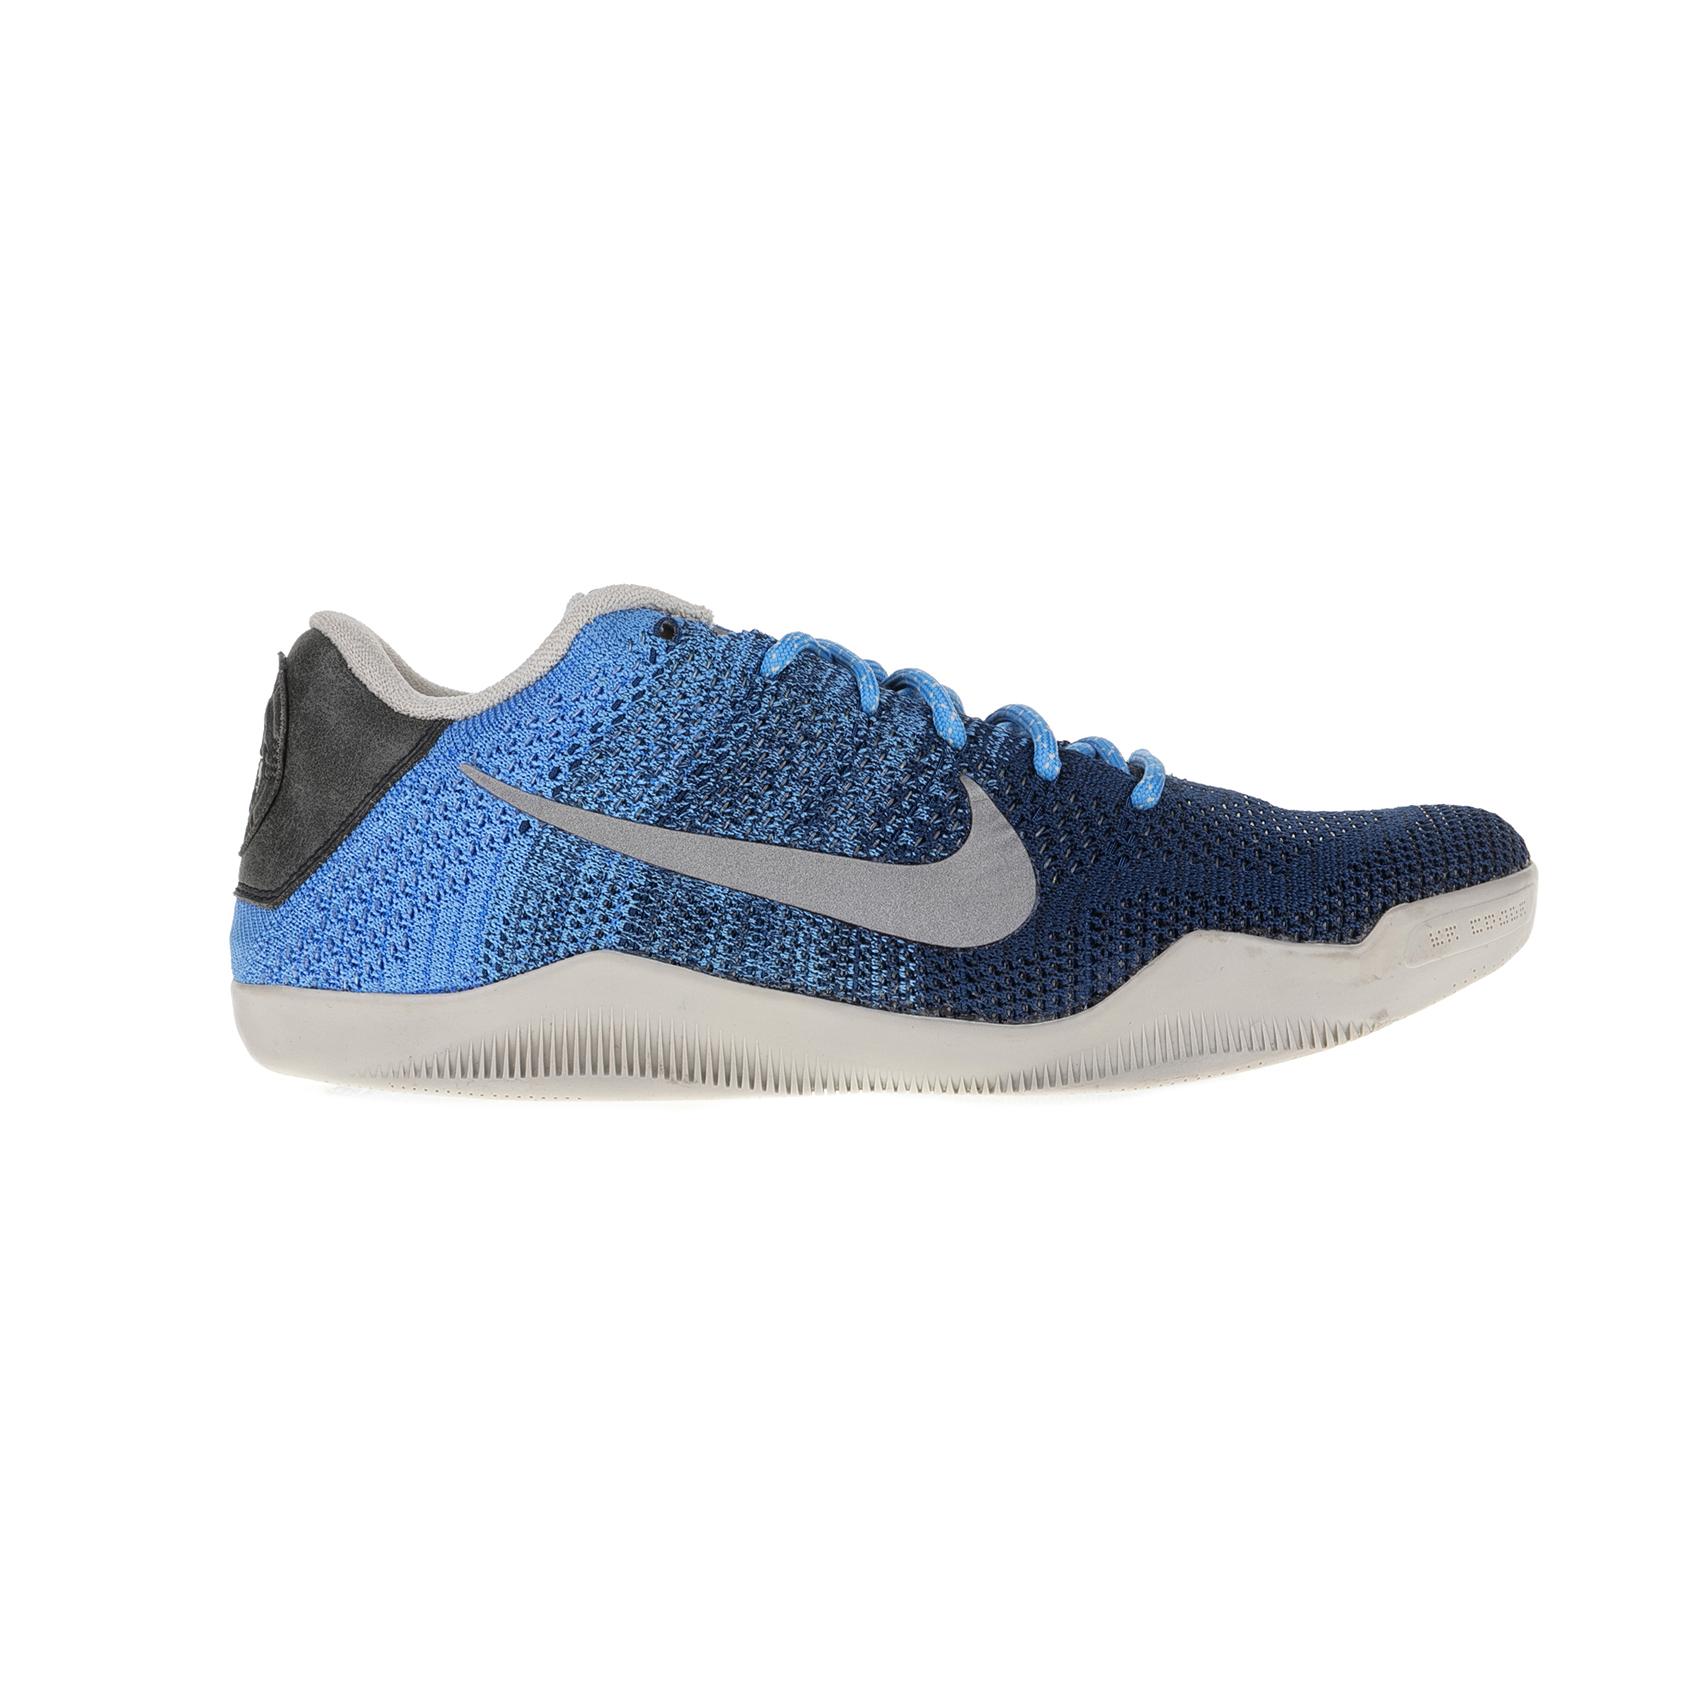 NIKE – Ανδρικά παπούτσια μπάσκετ Nike KOBE XI ELITE LOW μπλε